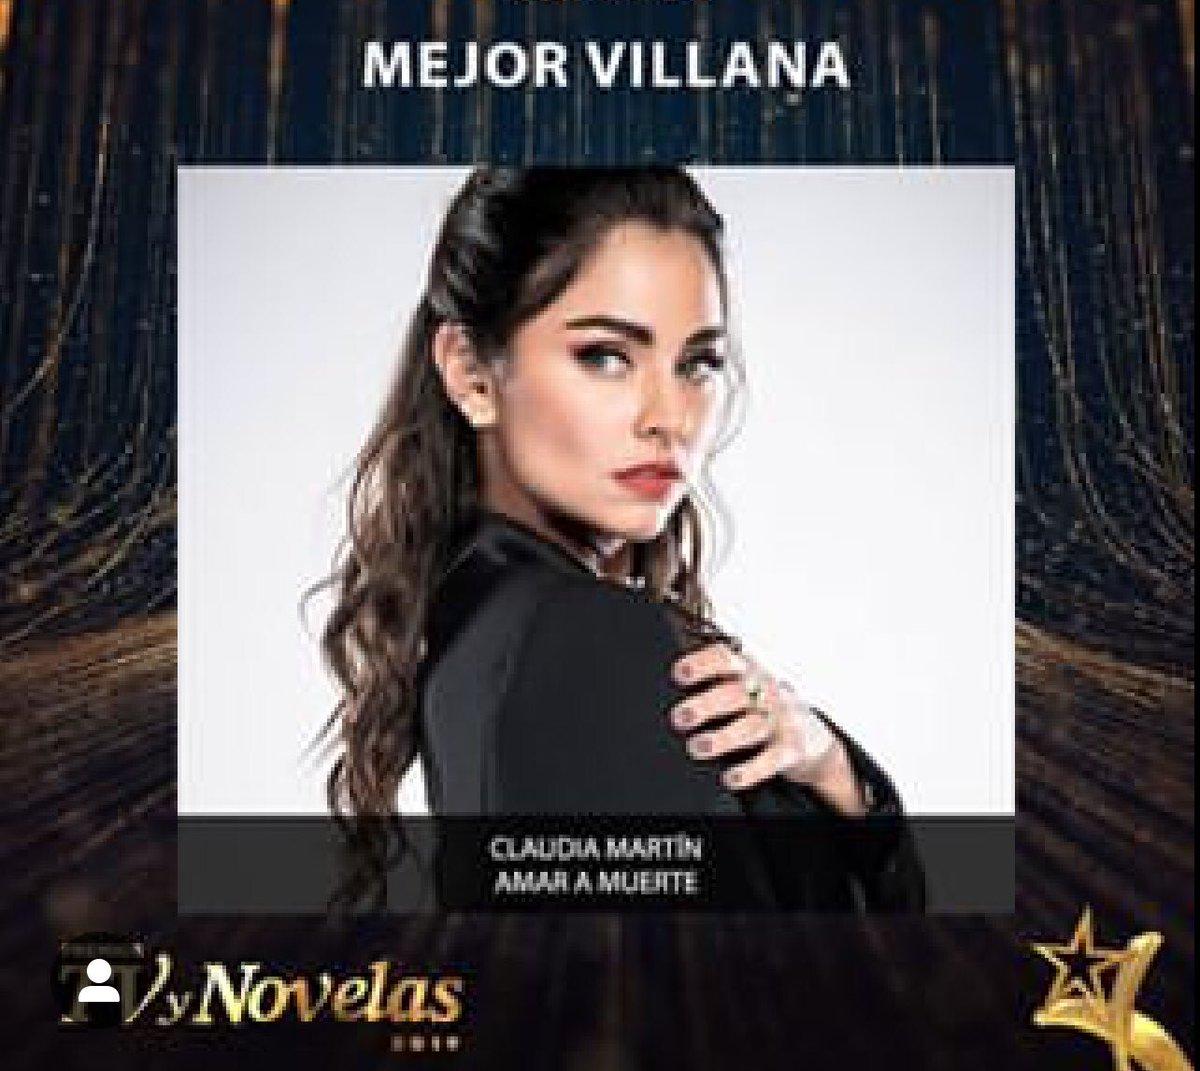 Telenovelas Televisa on Twitter: